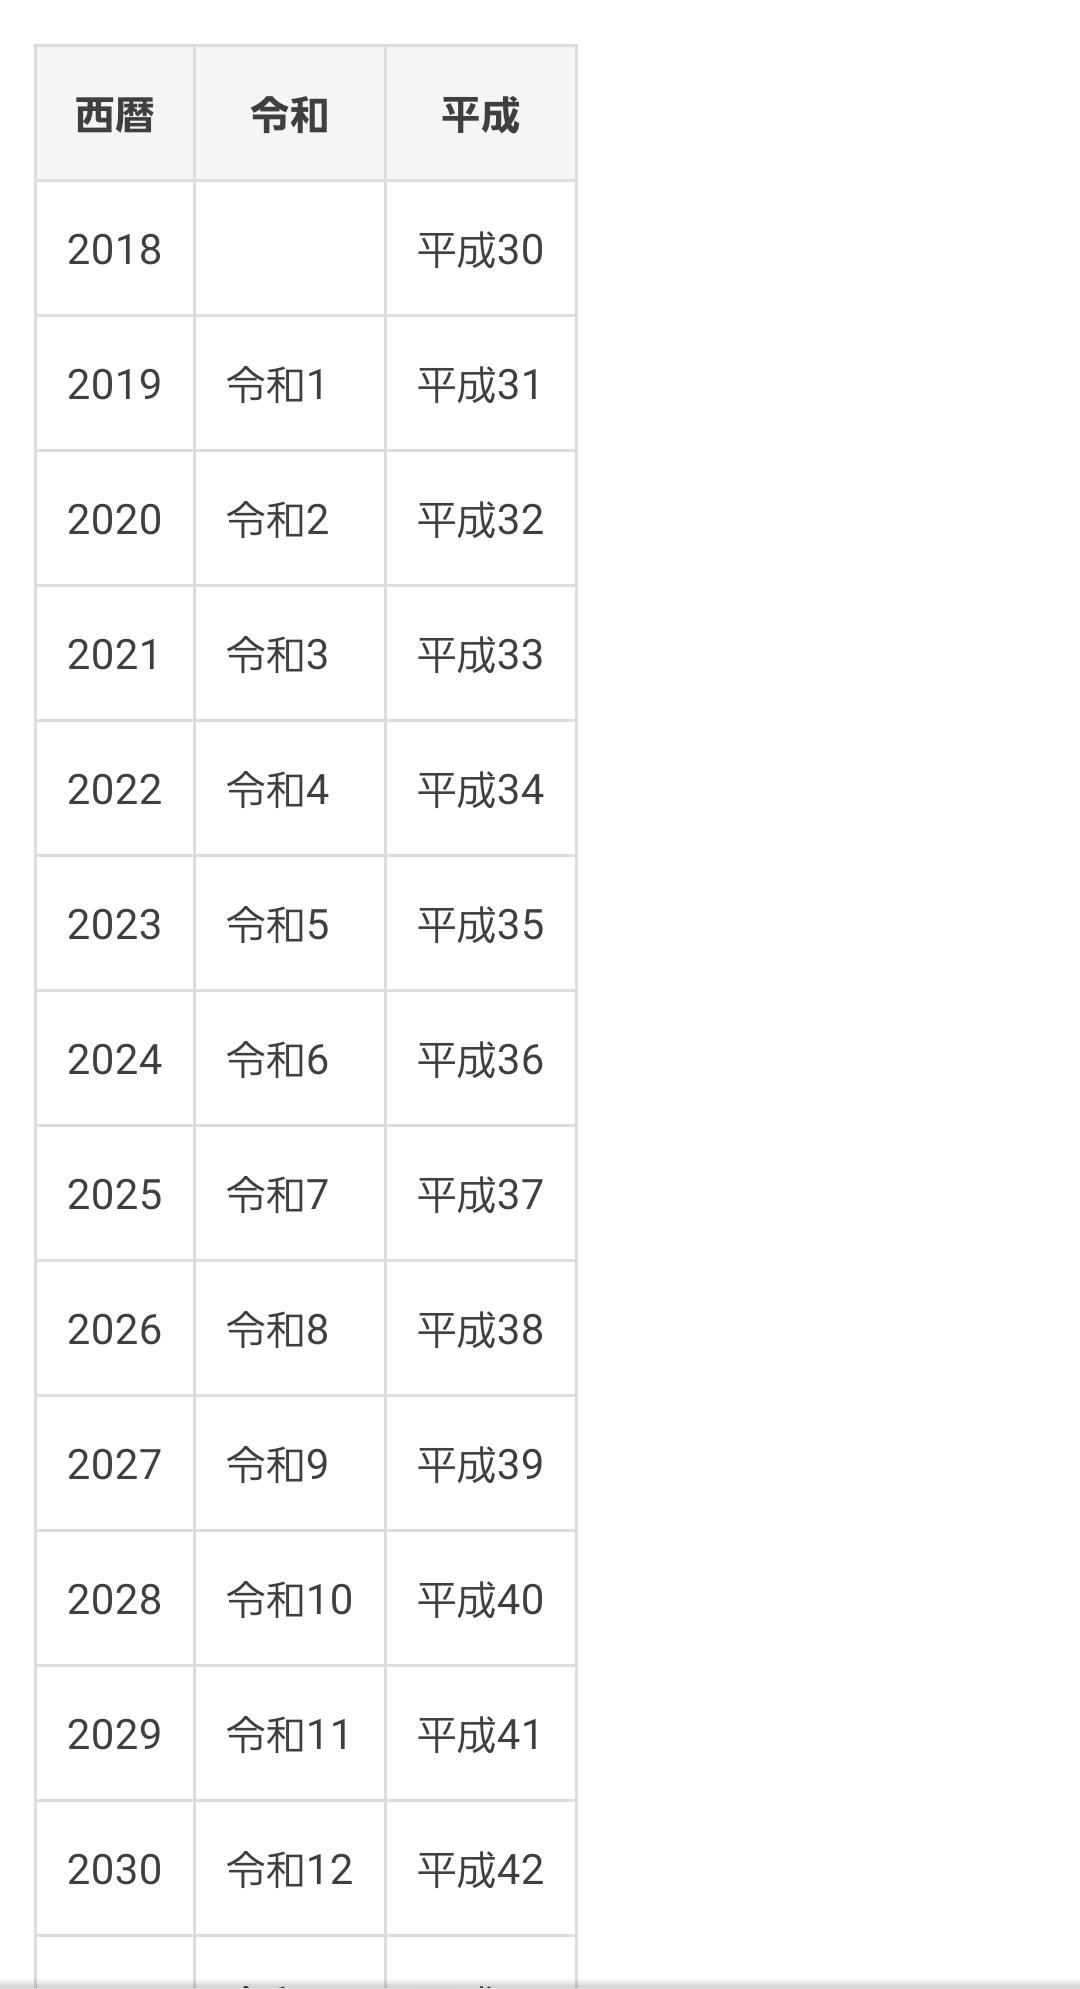 2021 年 は 平成 何 年